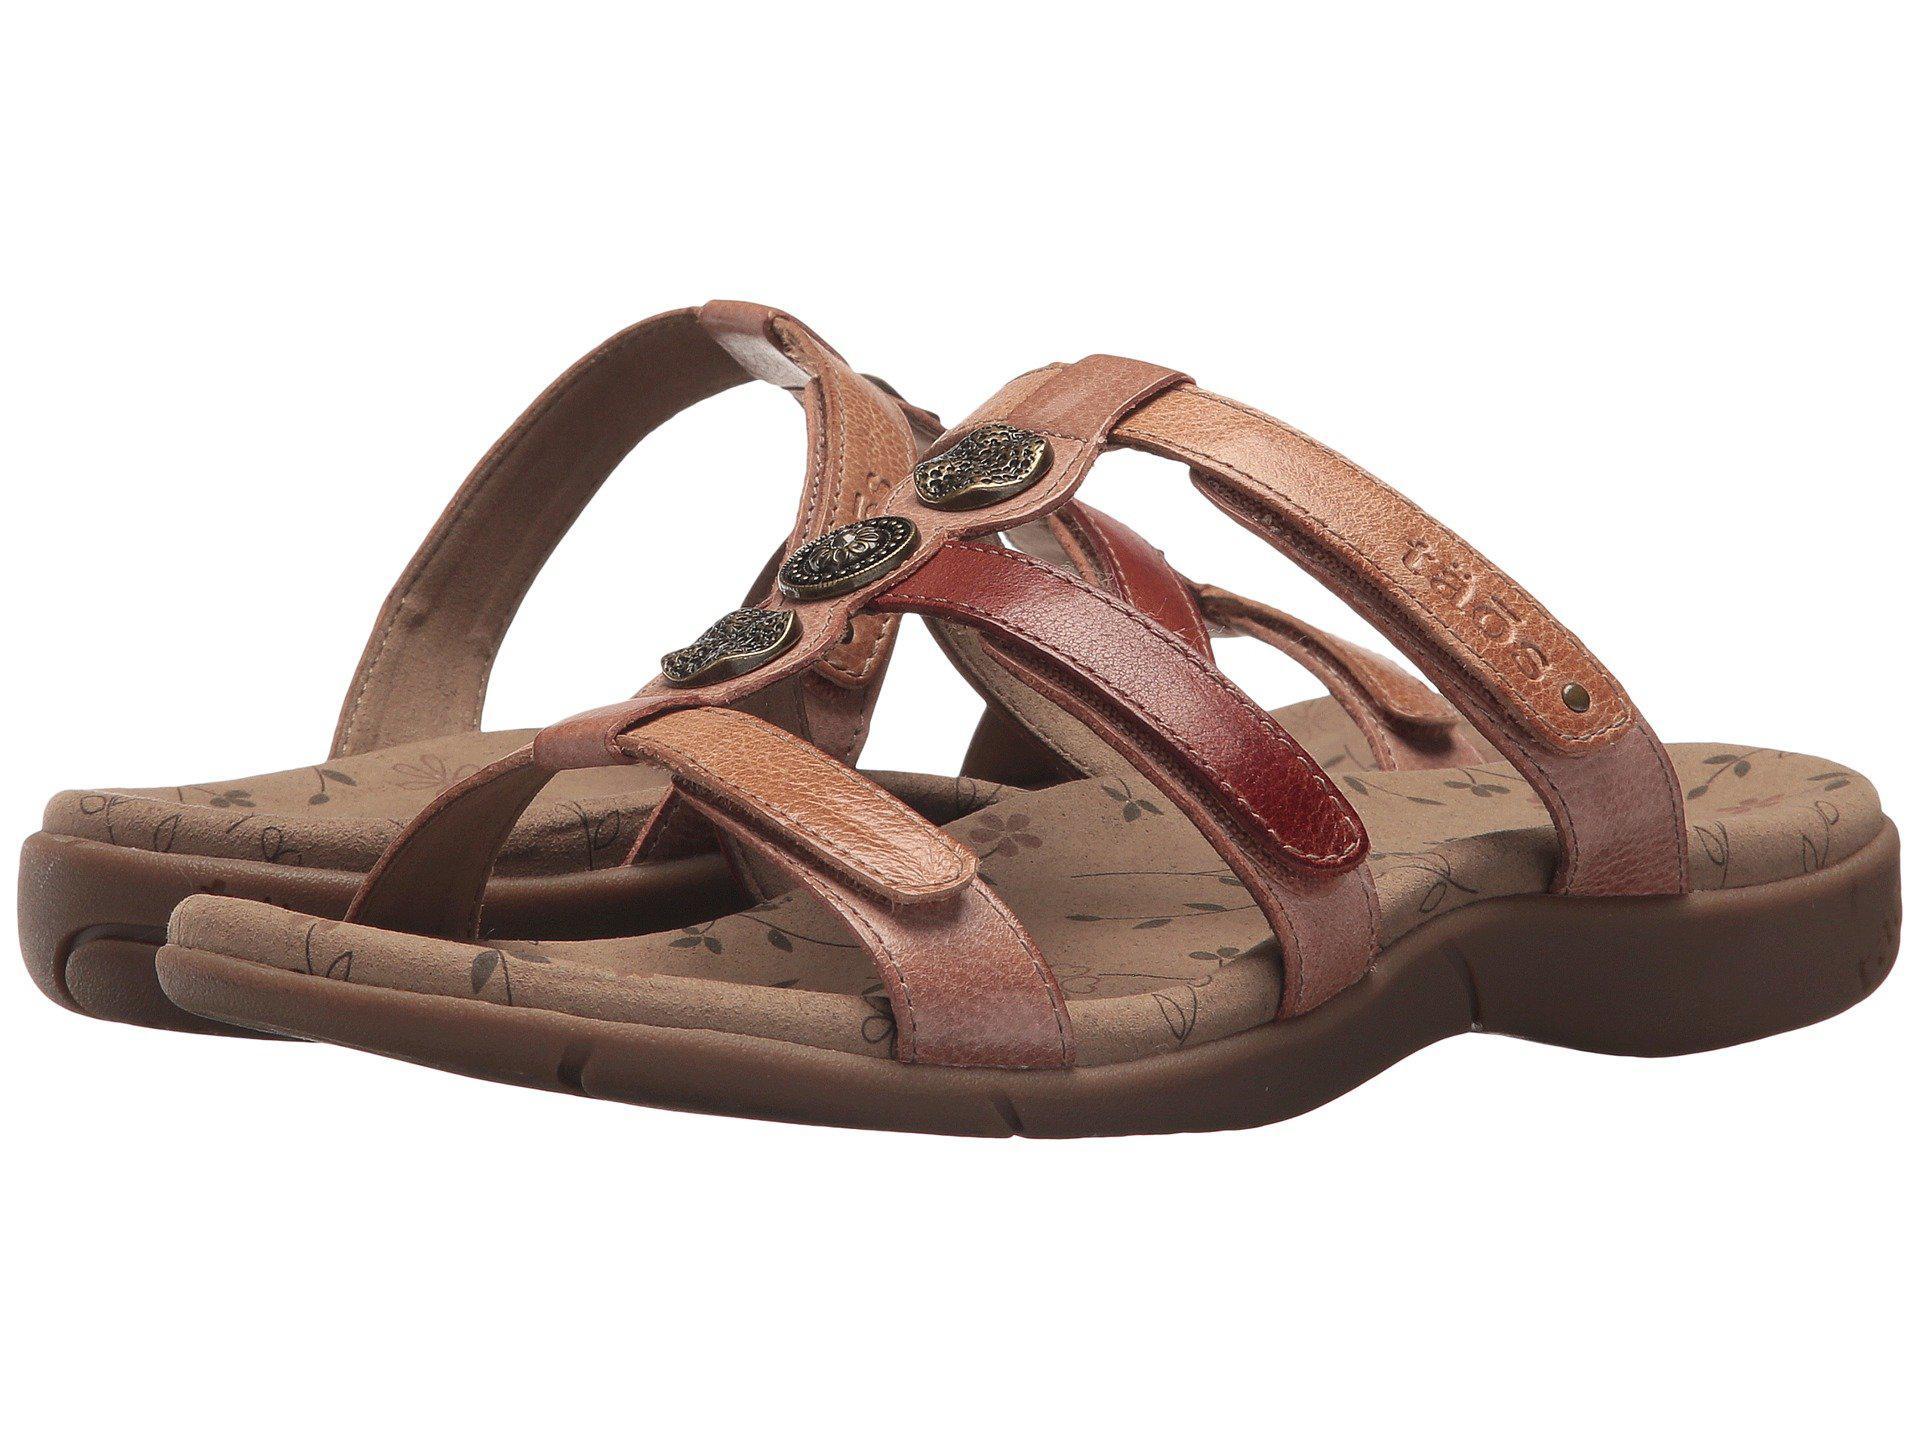 03c3d28b4dd1ad Lyst - Taos Footwear Prize 3 (blush Multi) Women s Shoes in Brown